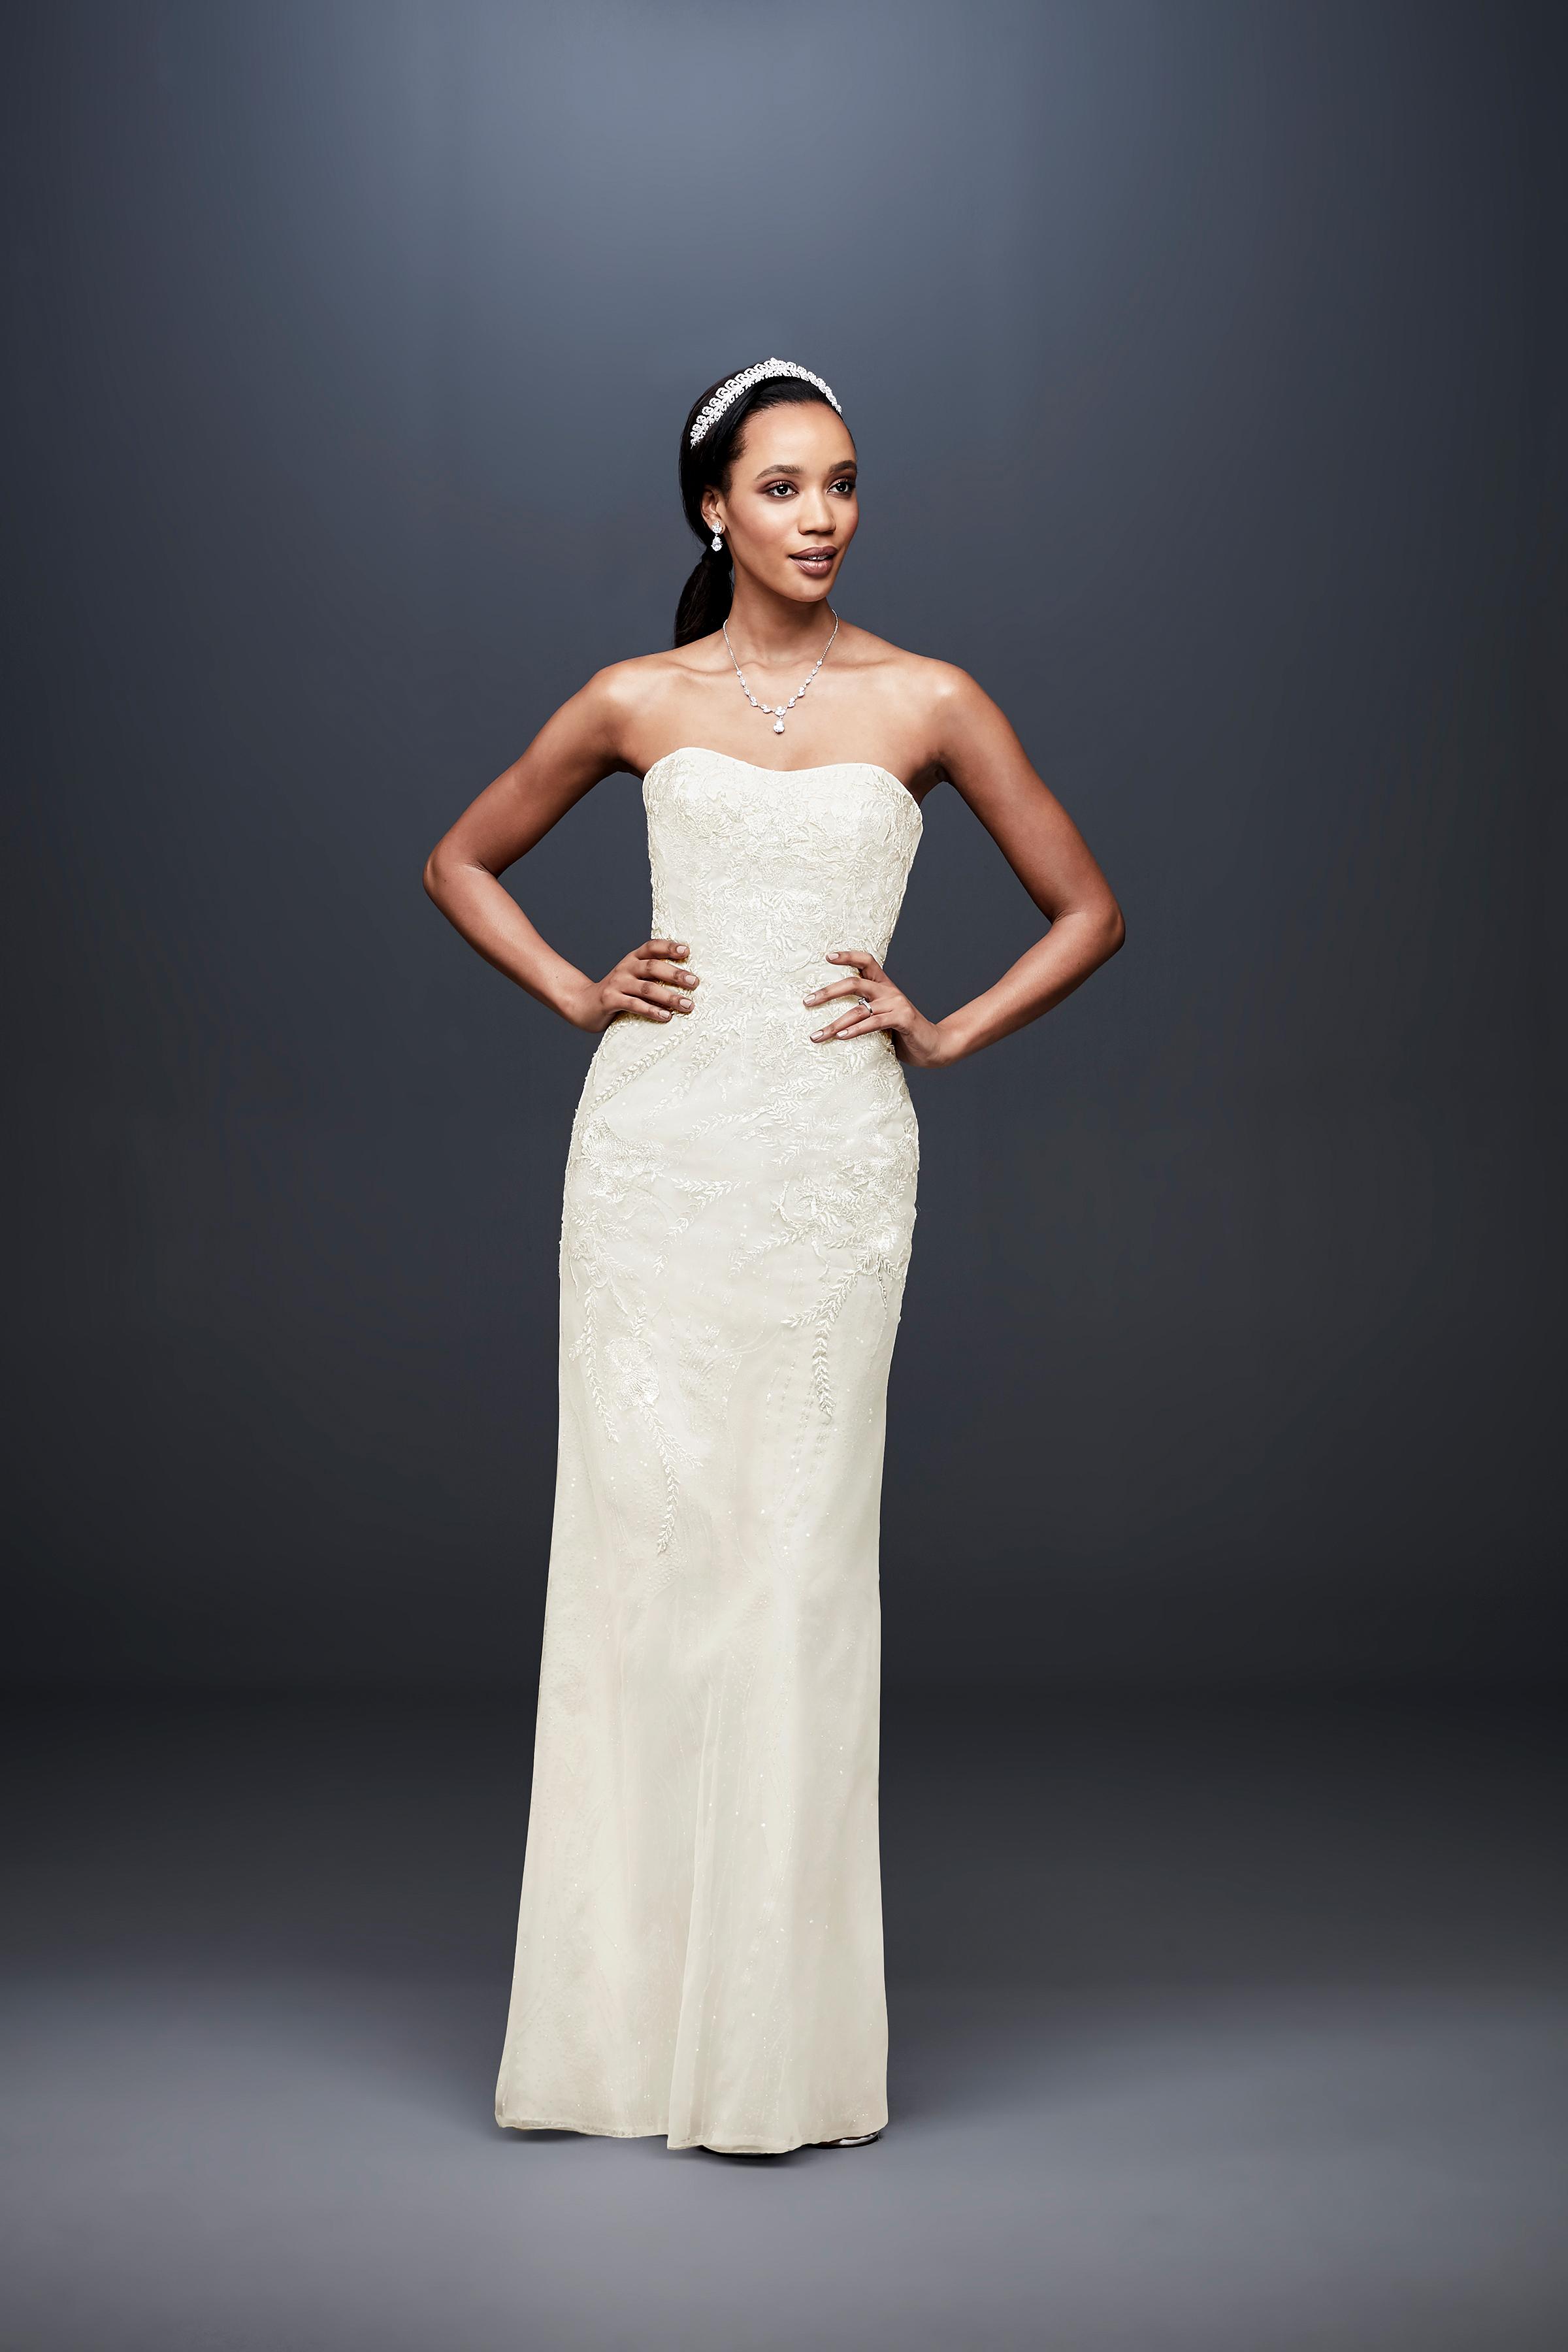 david bridal wedding dress spring 2019 strapless sheath sweatheart